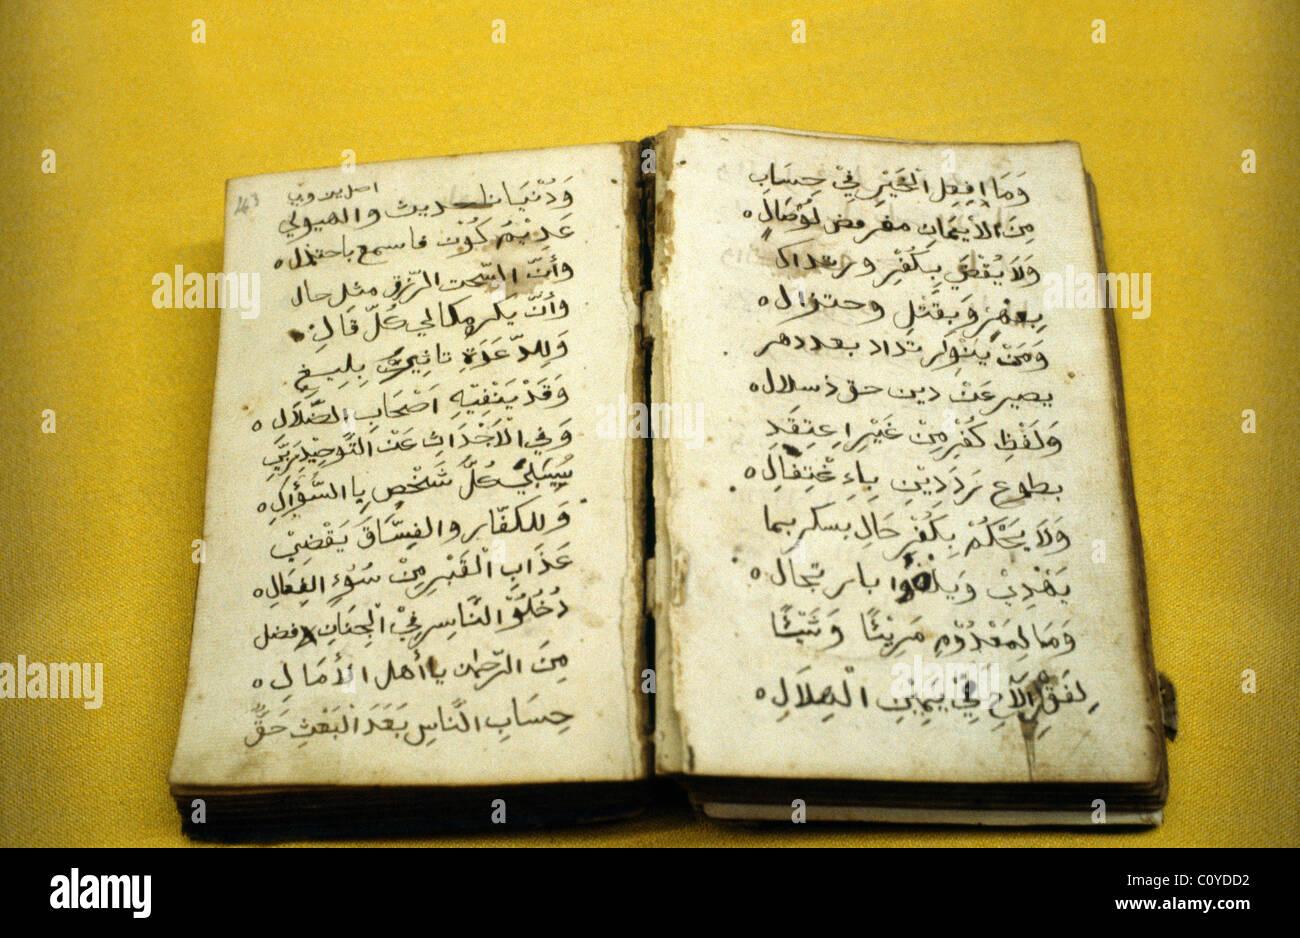 Early Quran Manuscript - Stock Image